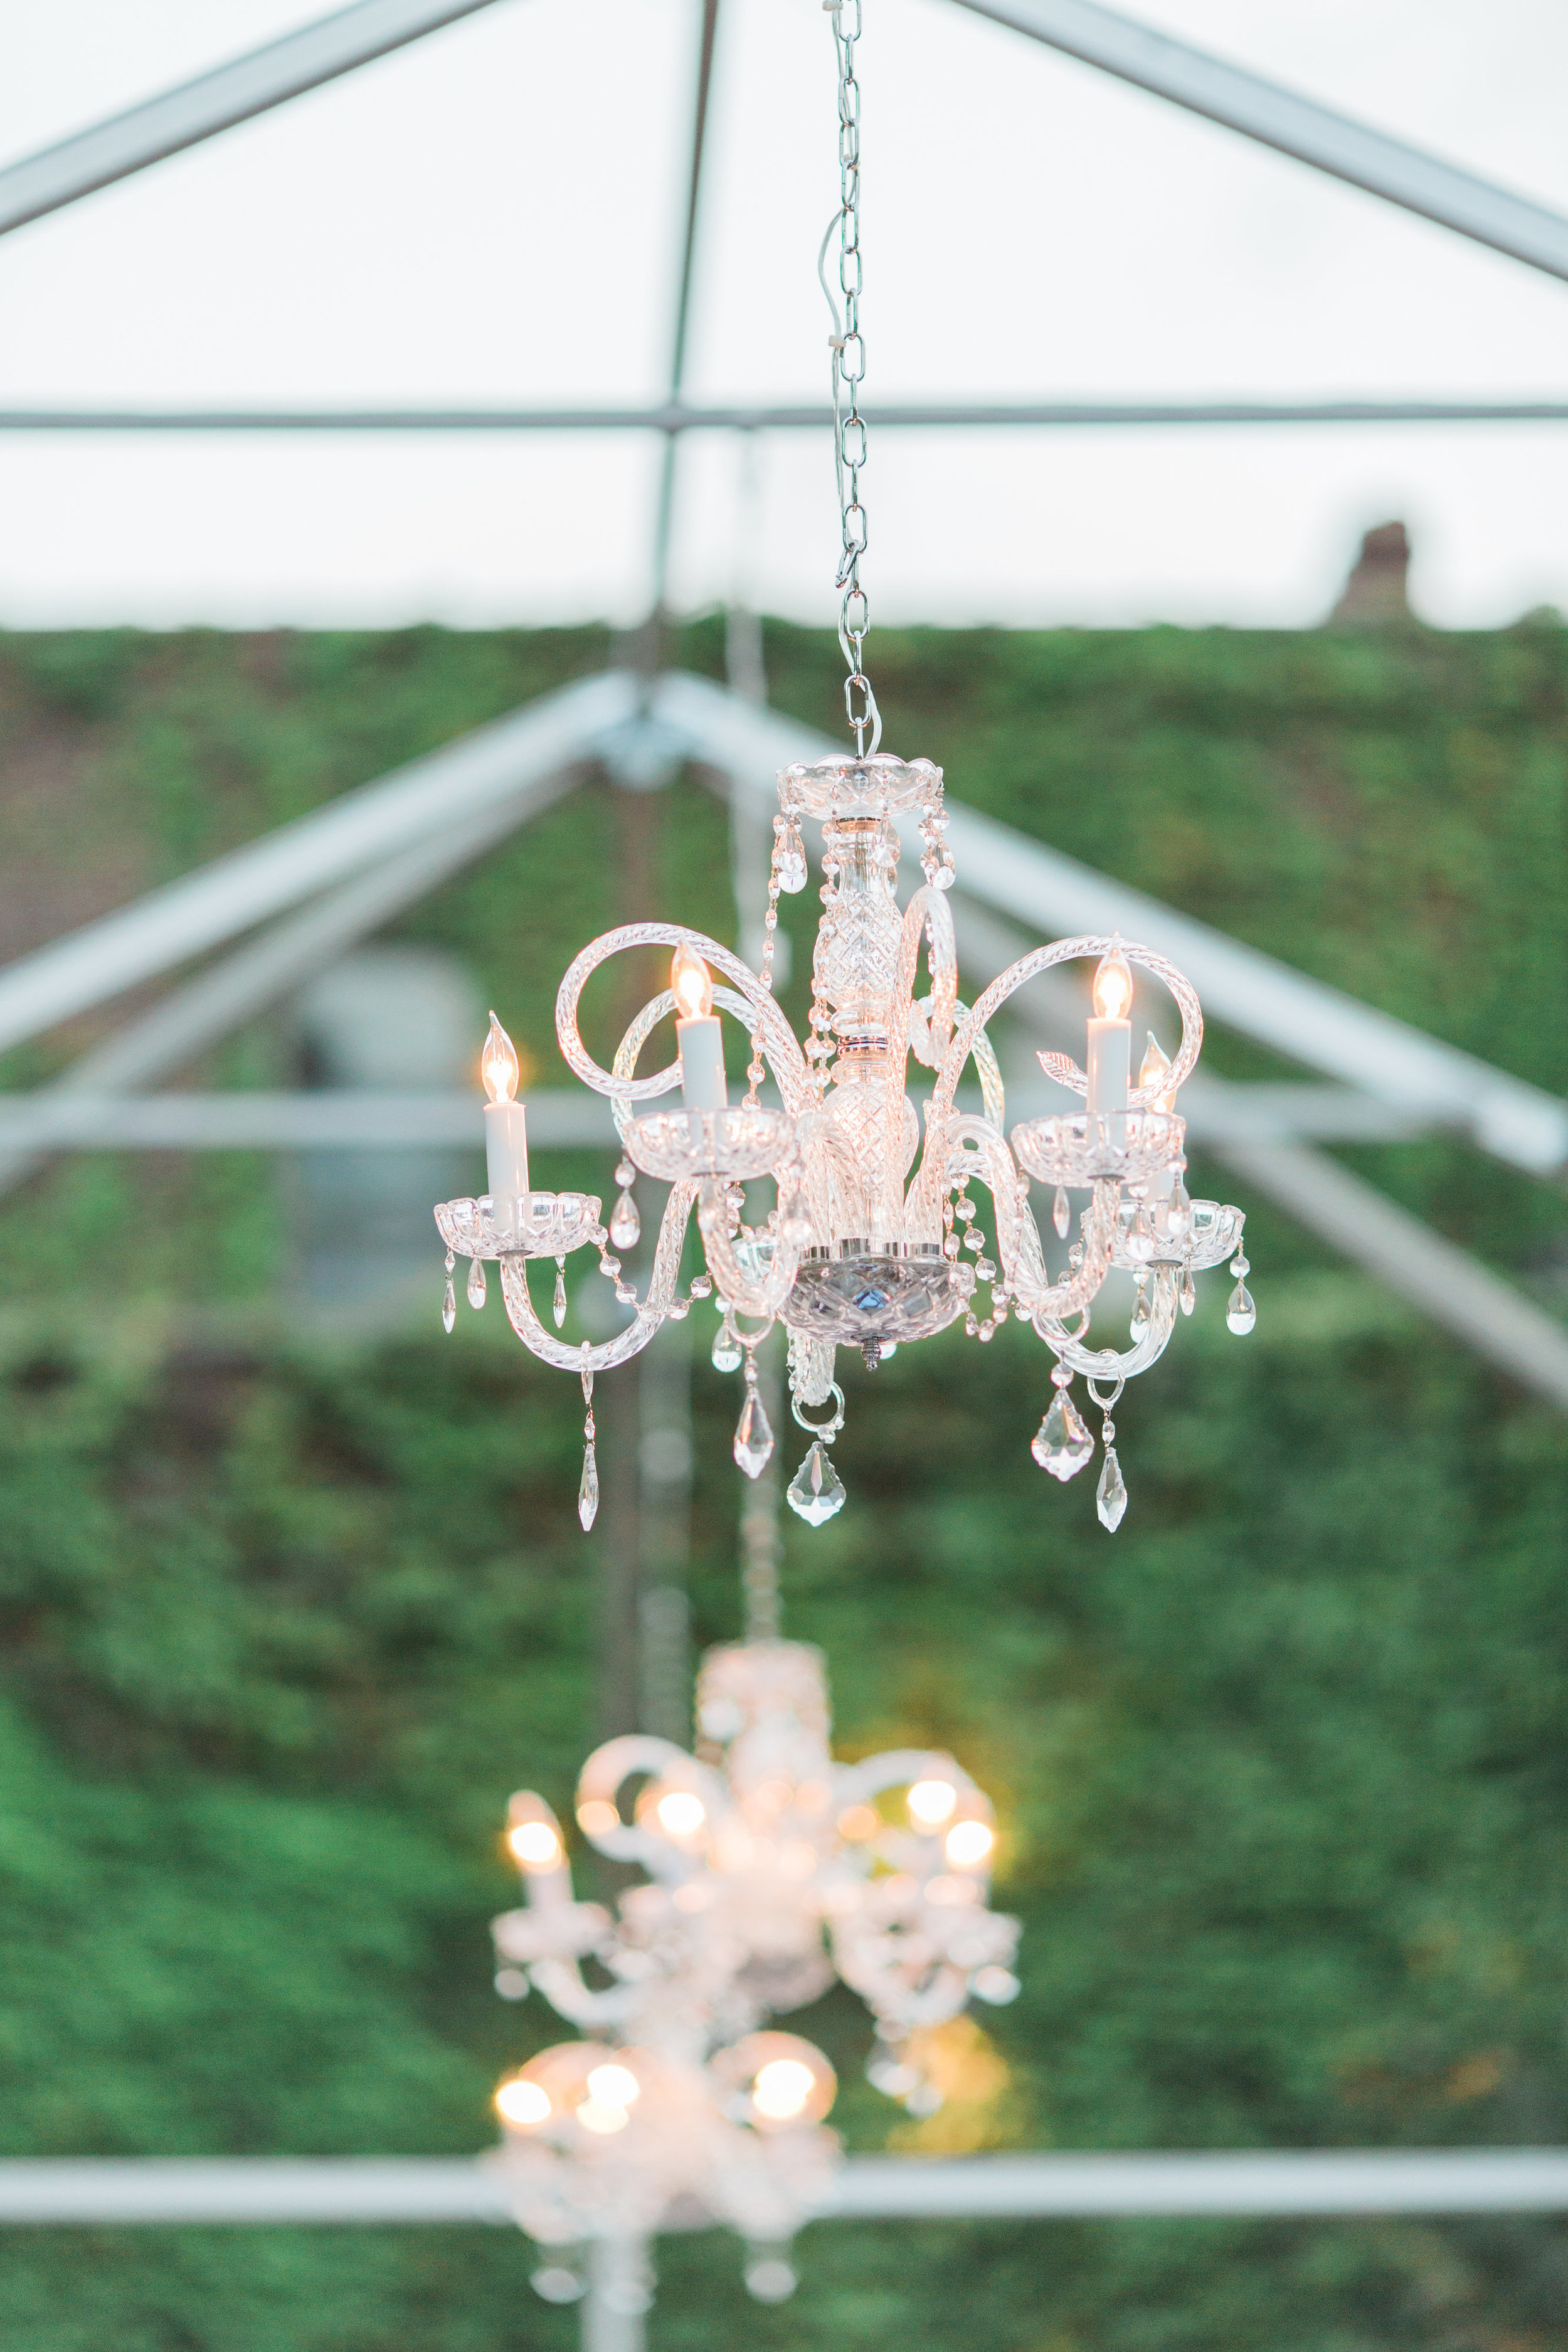 Dancing & Dessert chandelier styling